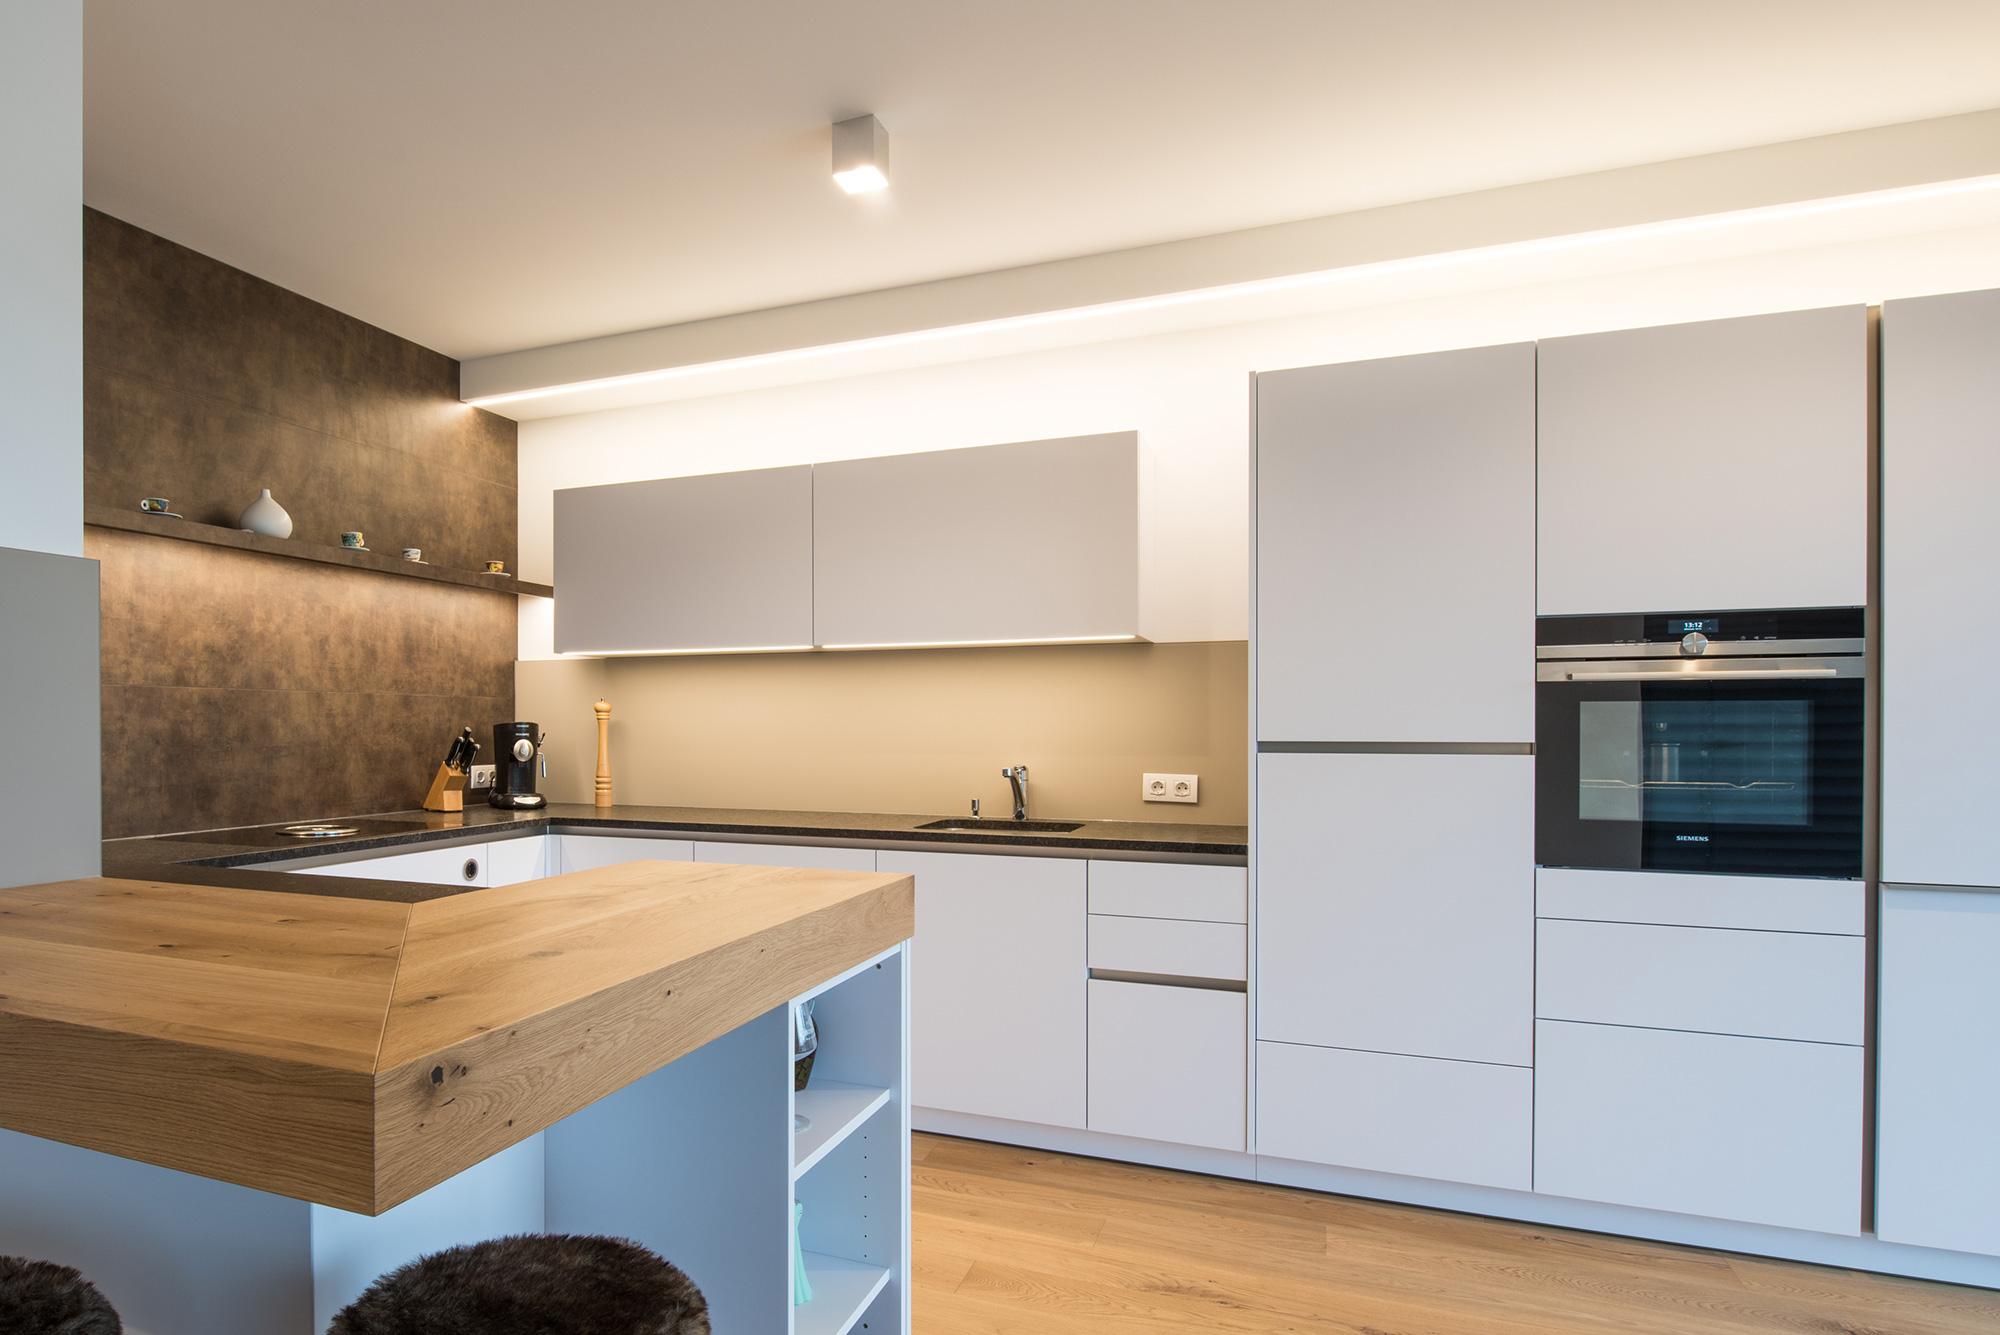 Küchen - Kieslinger - Wohnmanufaktur - Sigharting